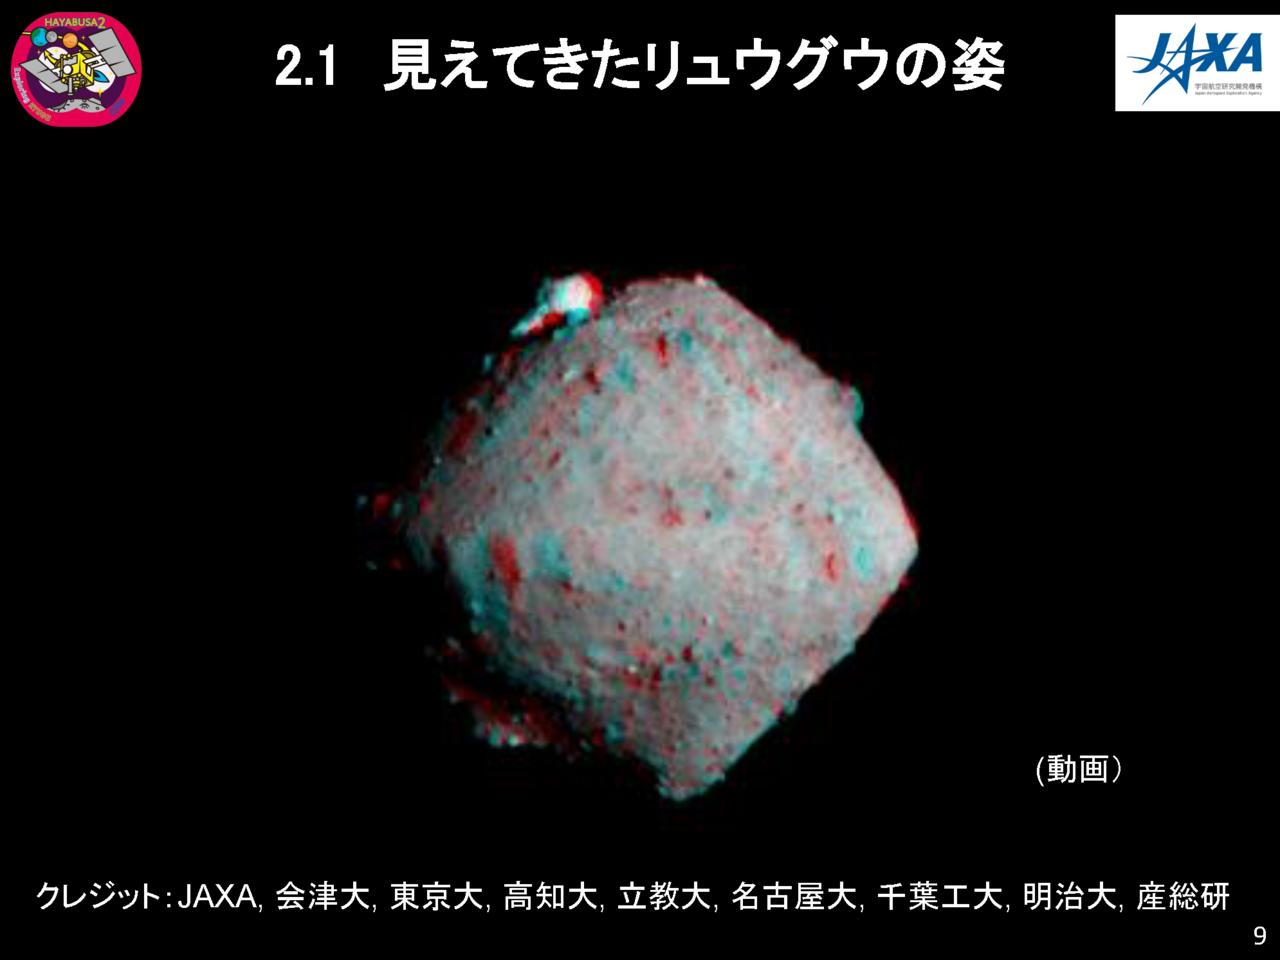 f:id:Imamura:20180719131704p:plain